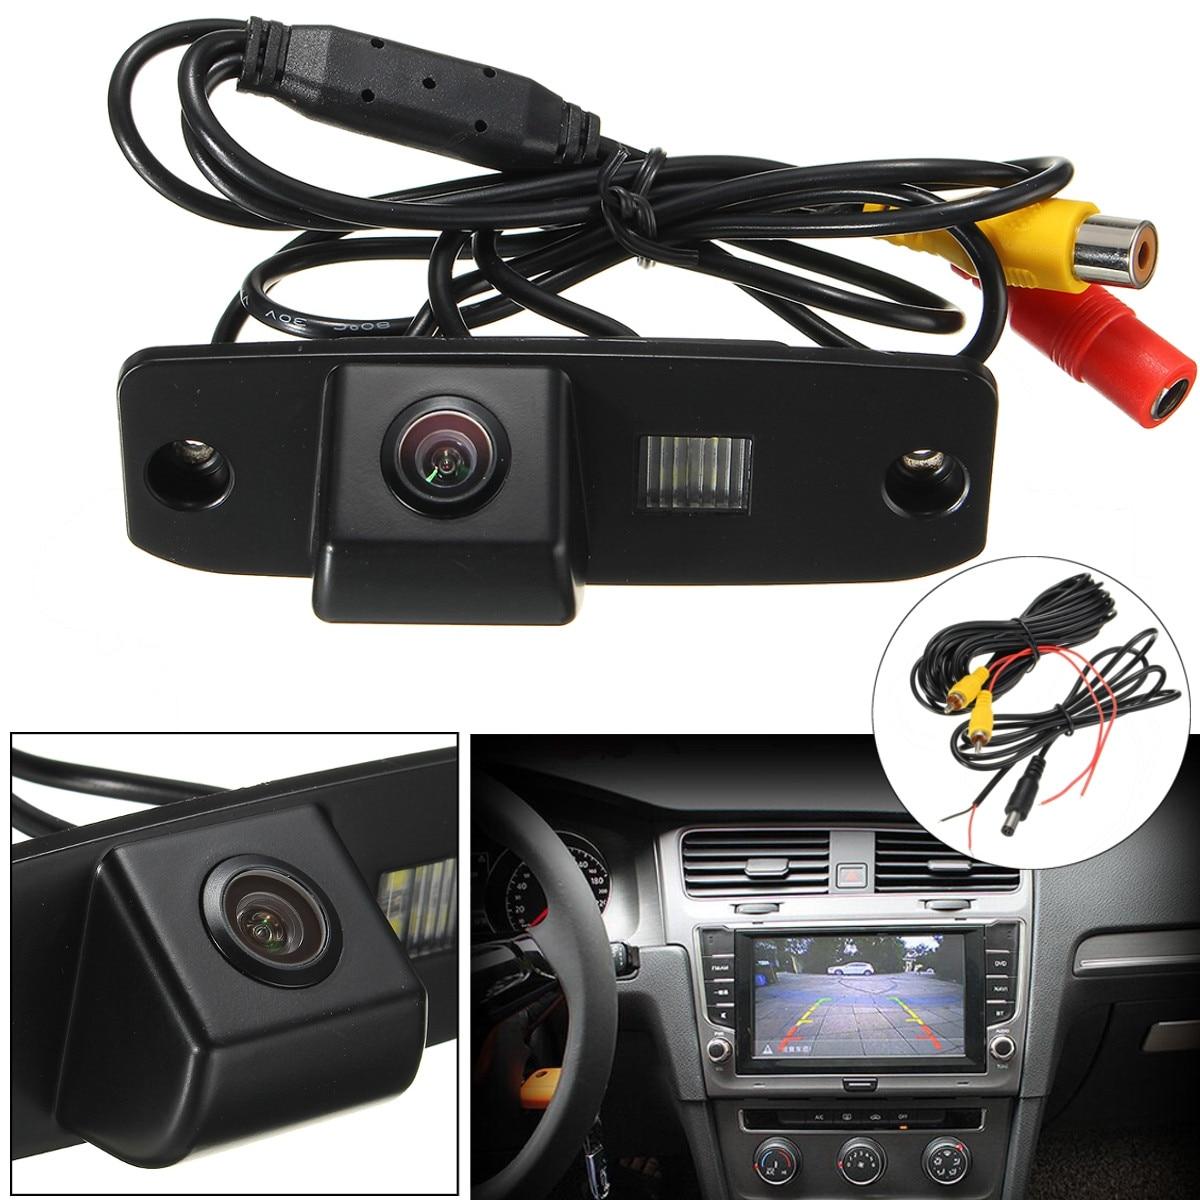 CCD Auto HD Car Rear View Camera Rearview Reverse Parking Waterproof For Kia Sorento Opirus Carens For Hyundai Elantra